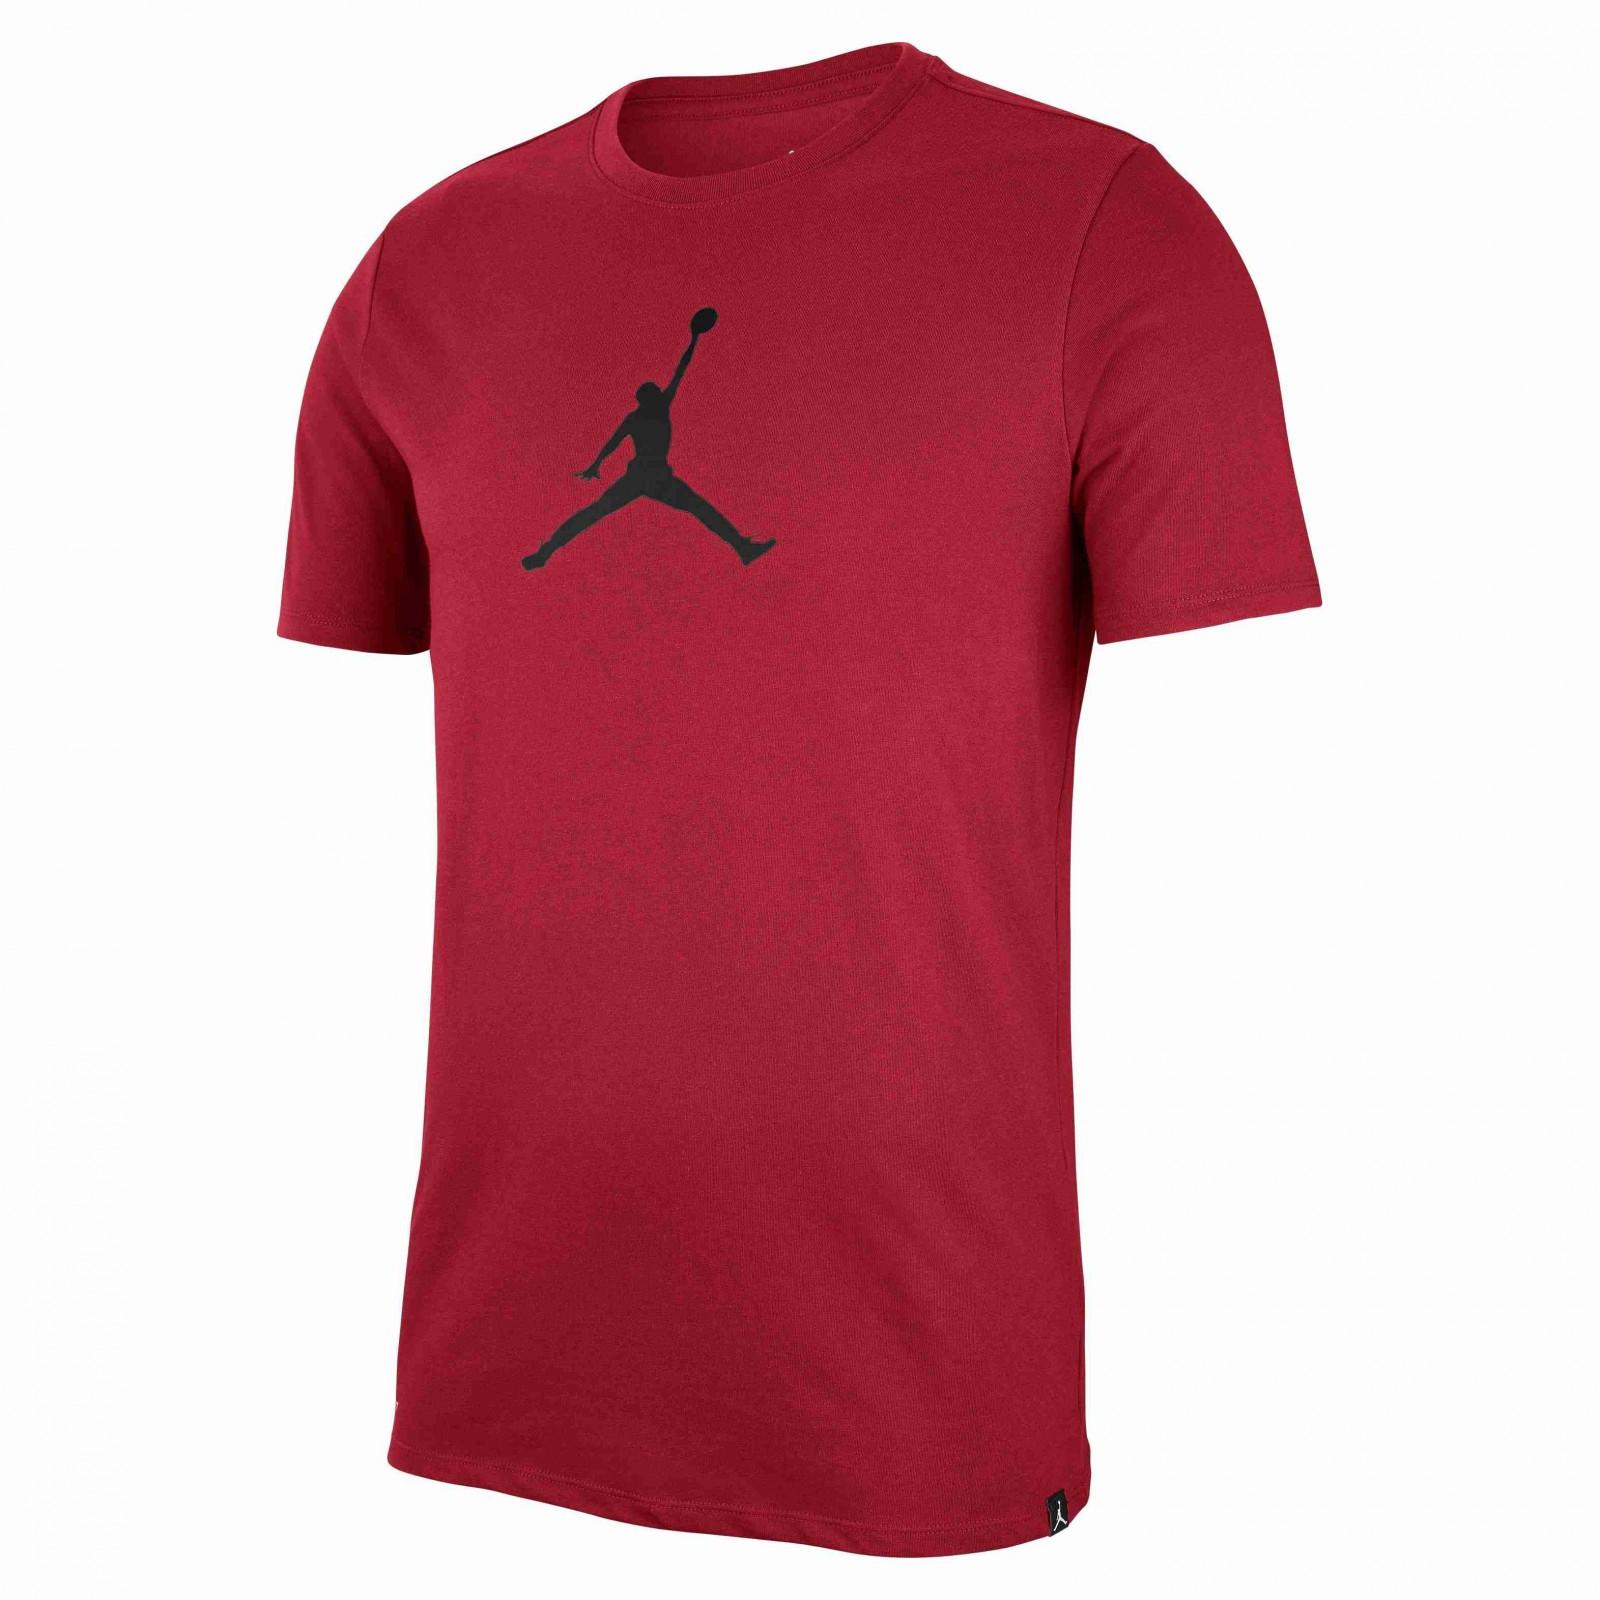 ... Tričko Jordan M JMTC TEE 23 7 JUMPMAN GYM RED BLACK. -14%. Pánské ... efeb21c72a1